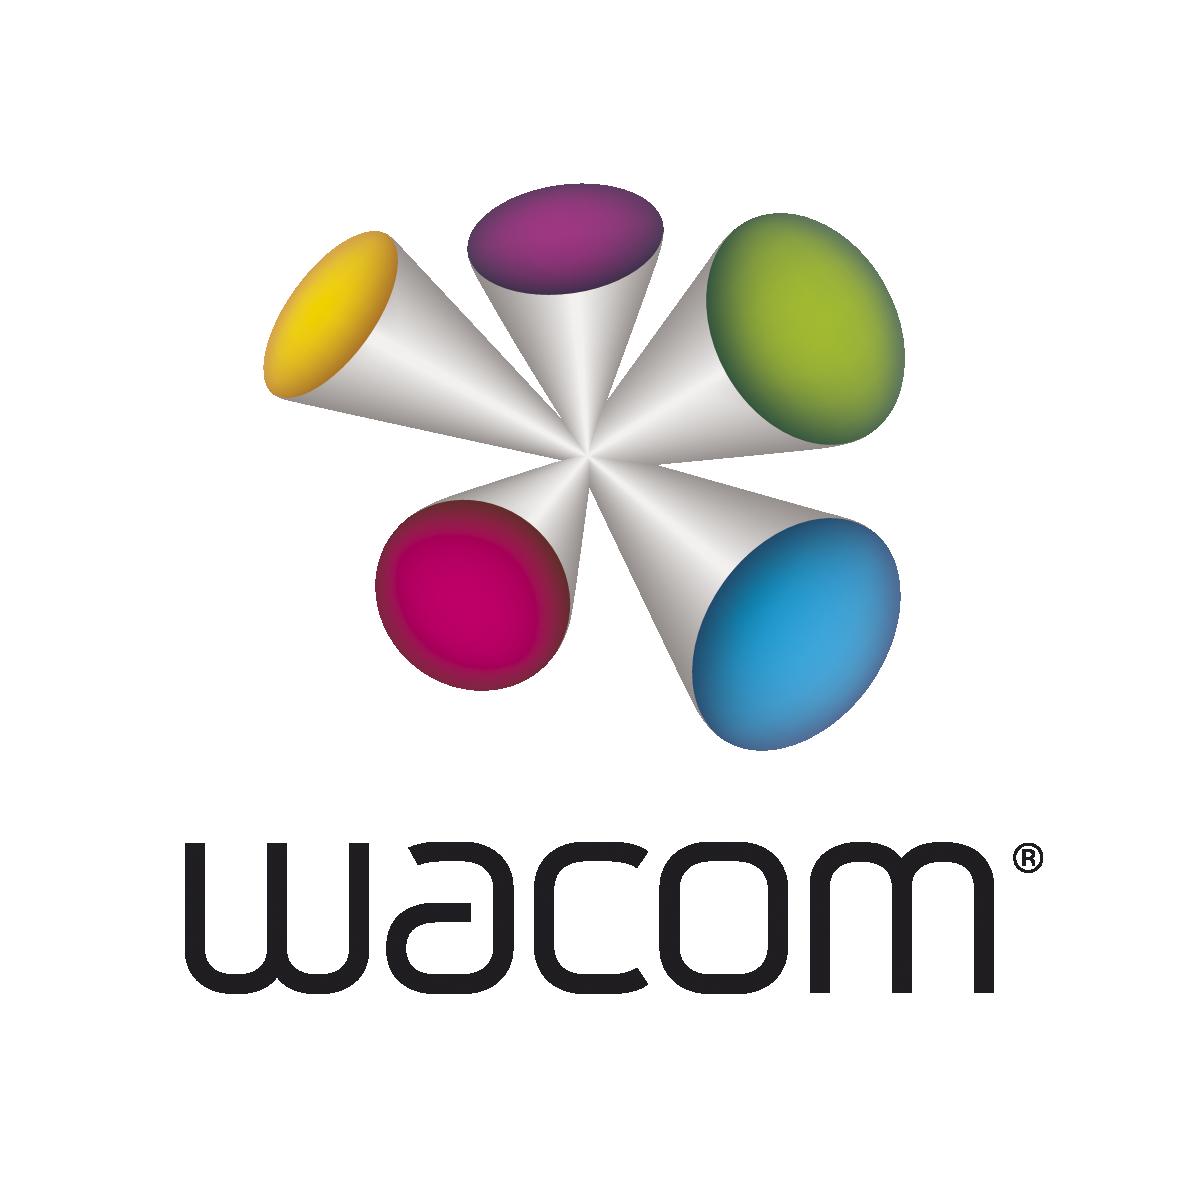 Image of Wacom logo.